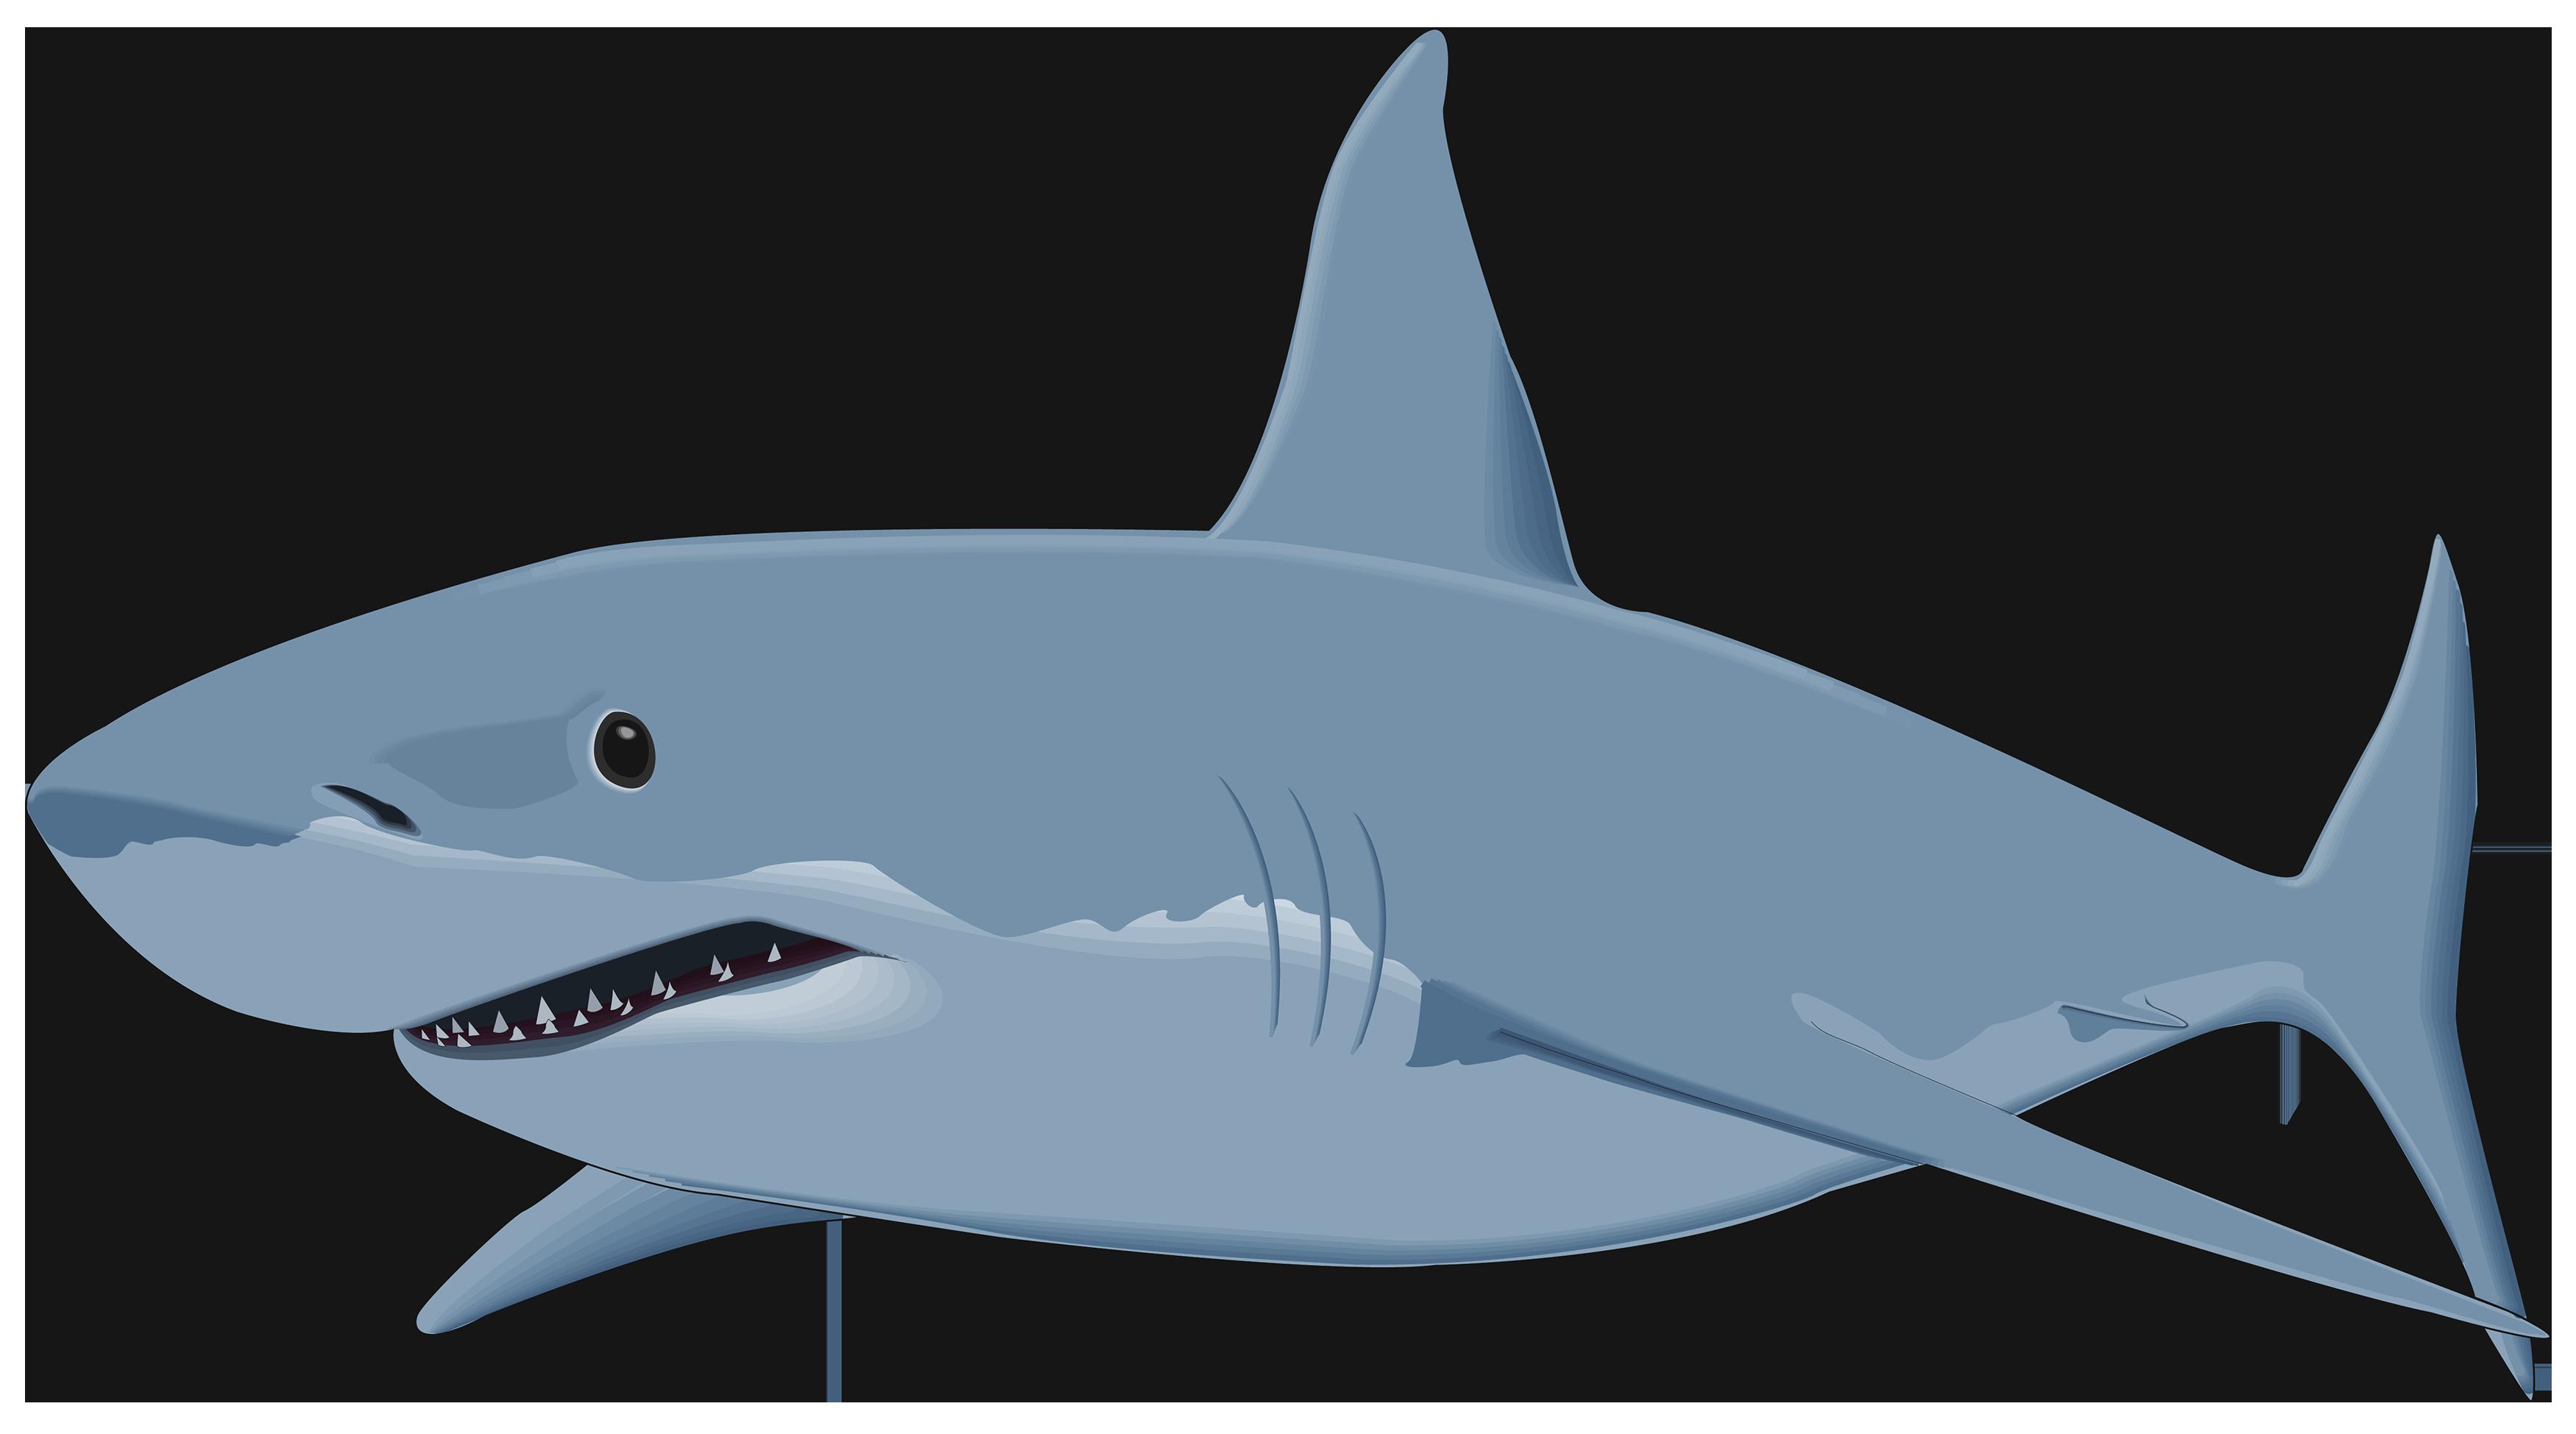 Shark clipart #20, Download drawings